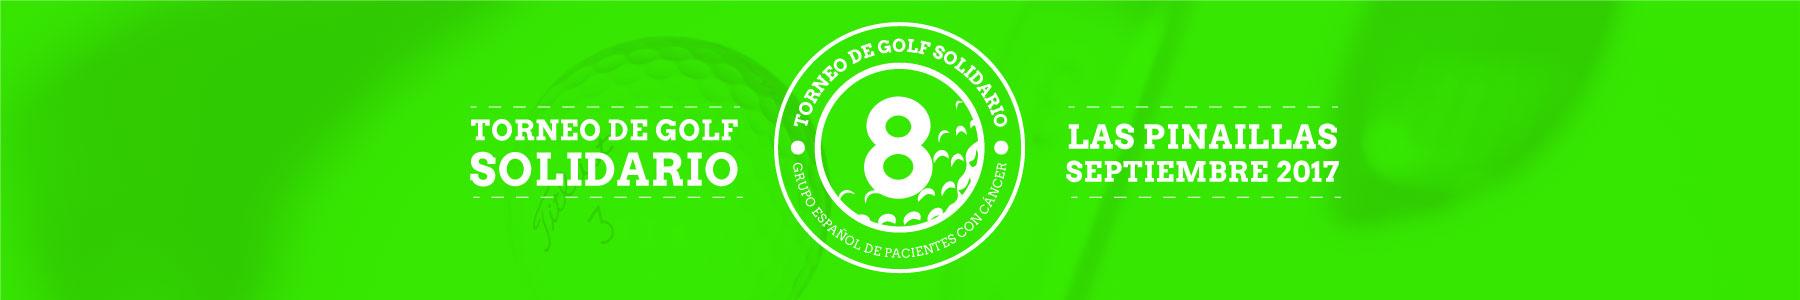 banner-golf-aeal-2017